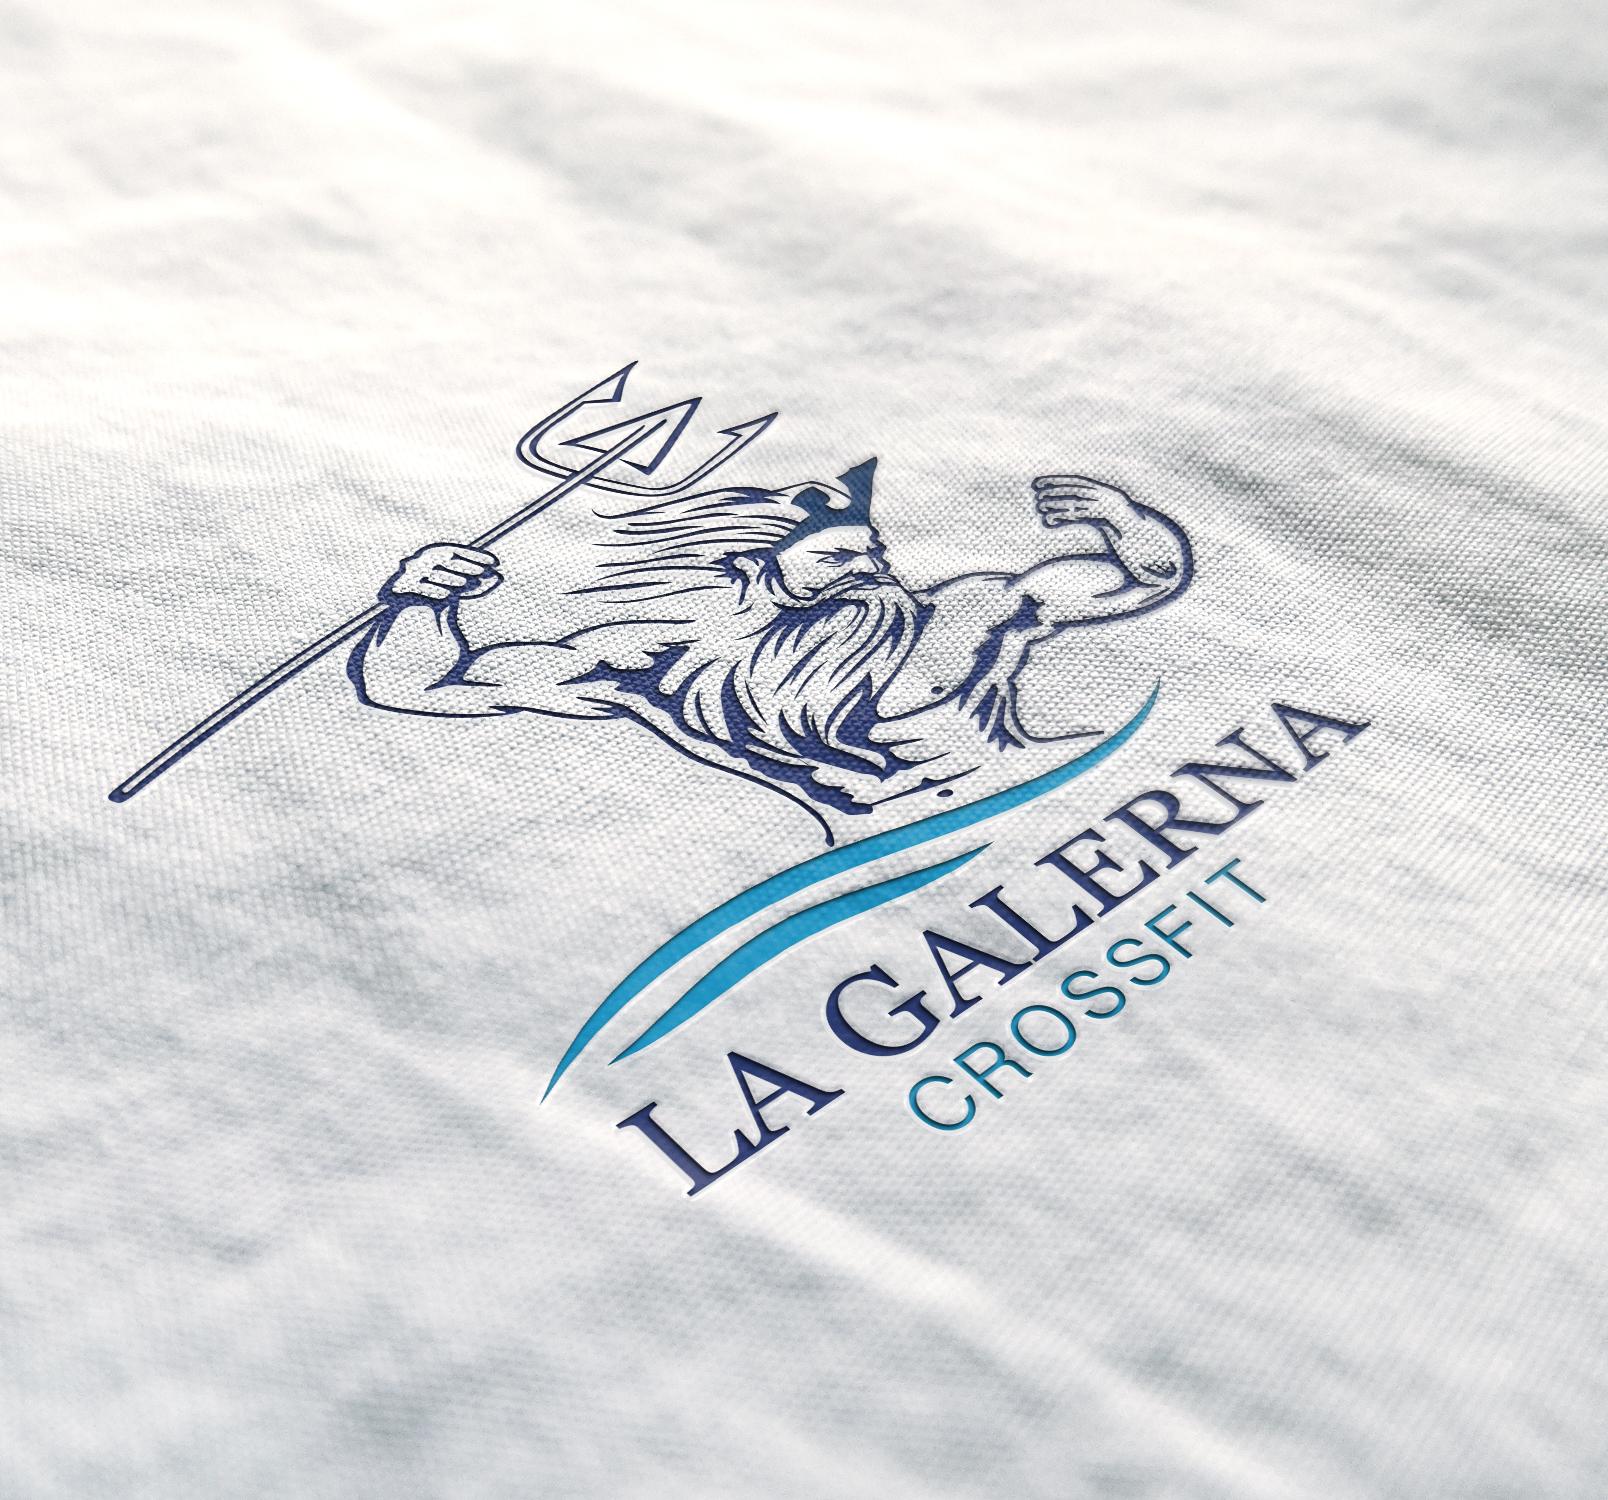 crossfit-lagalerna-logo-camiseta-branding.jpg